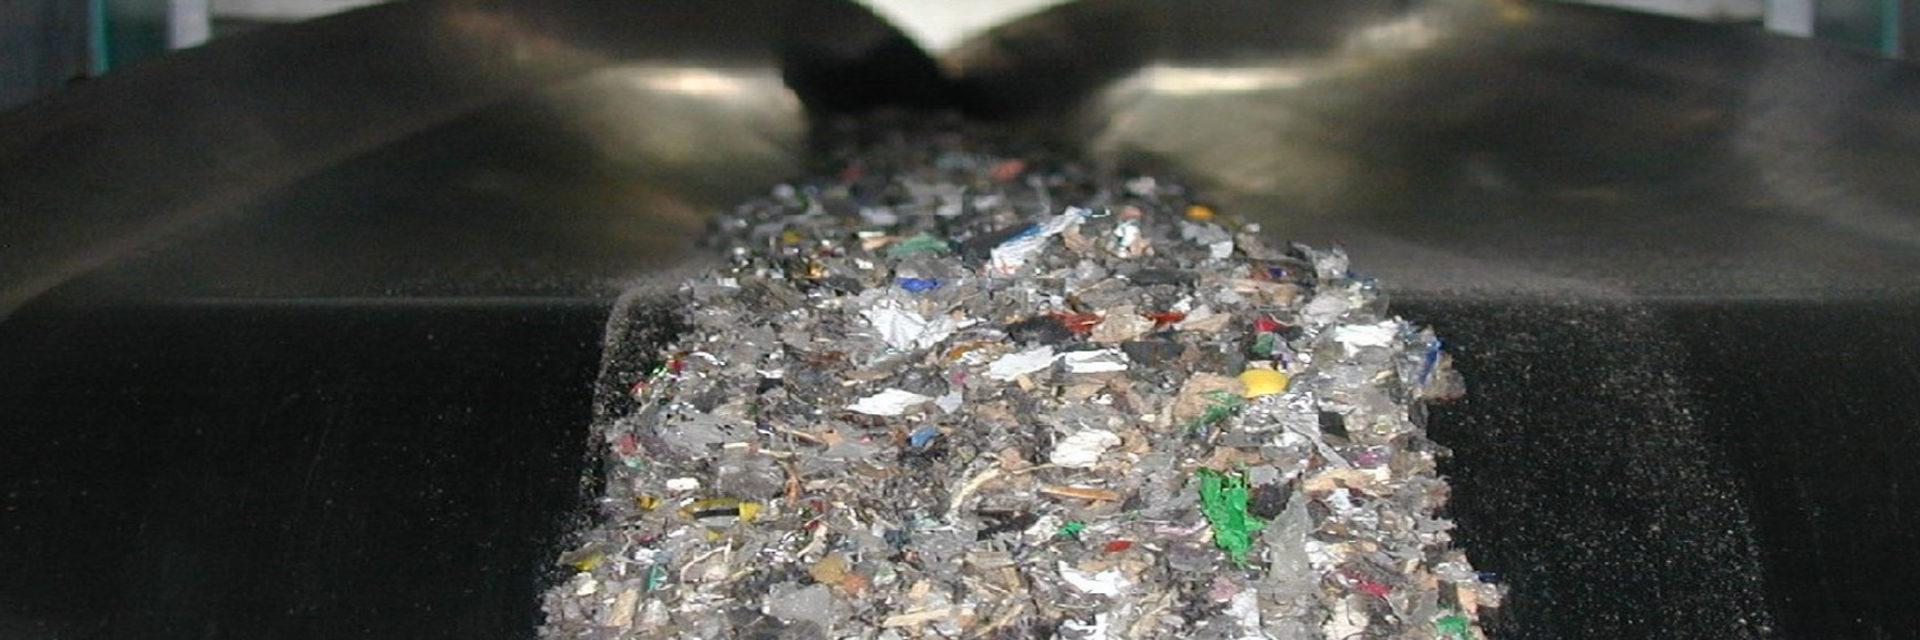 Alternative Fuel Recycling